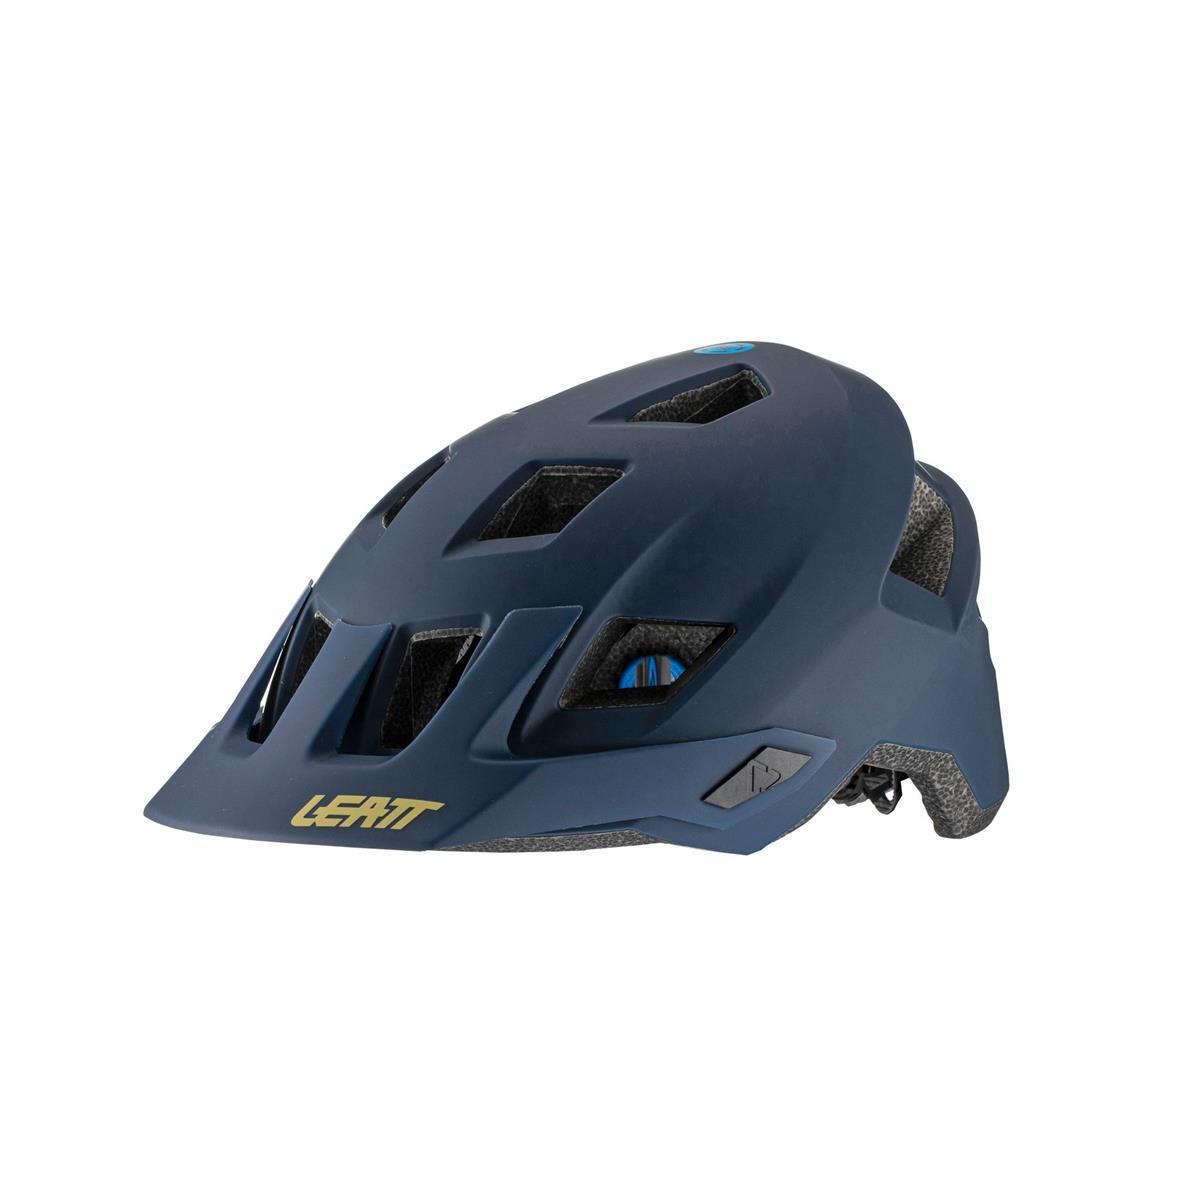 Helmet MTB 1.0 Turbine Technology Blue Size S (51-55cm)